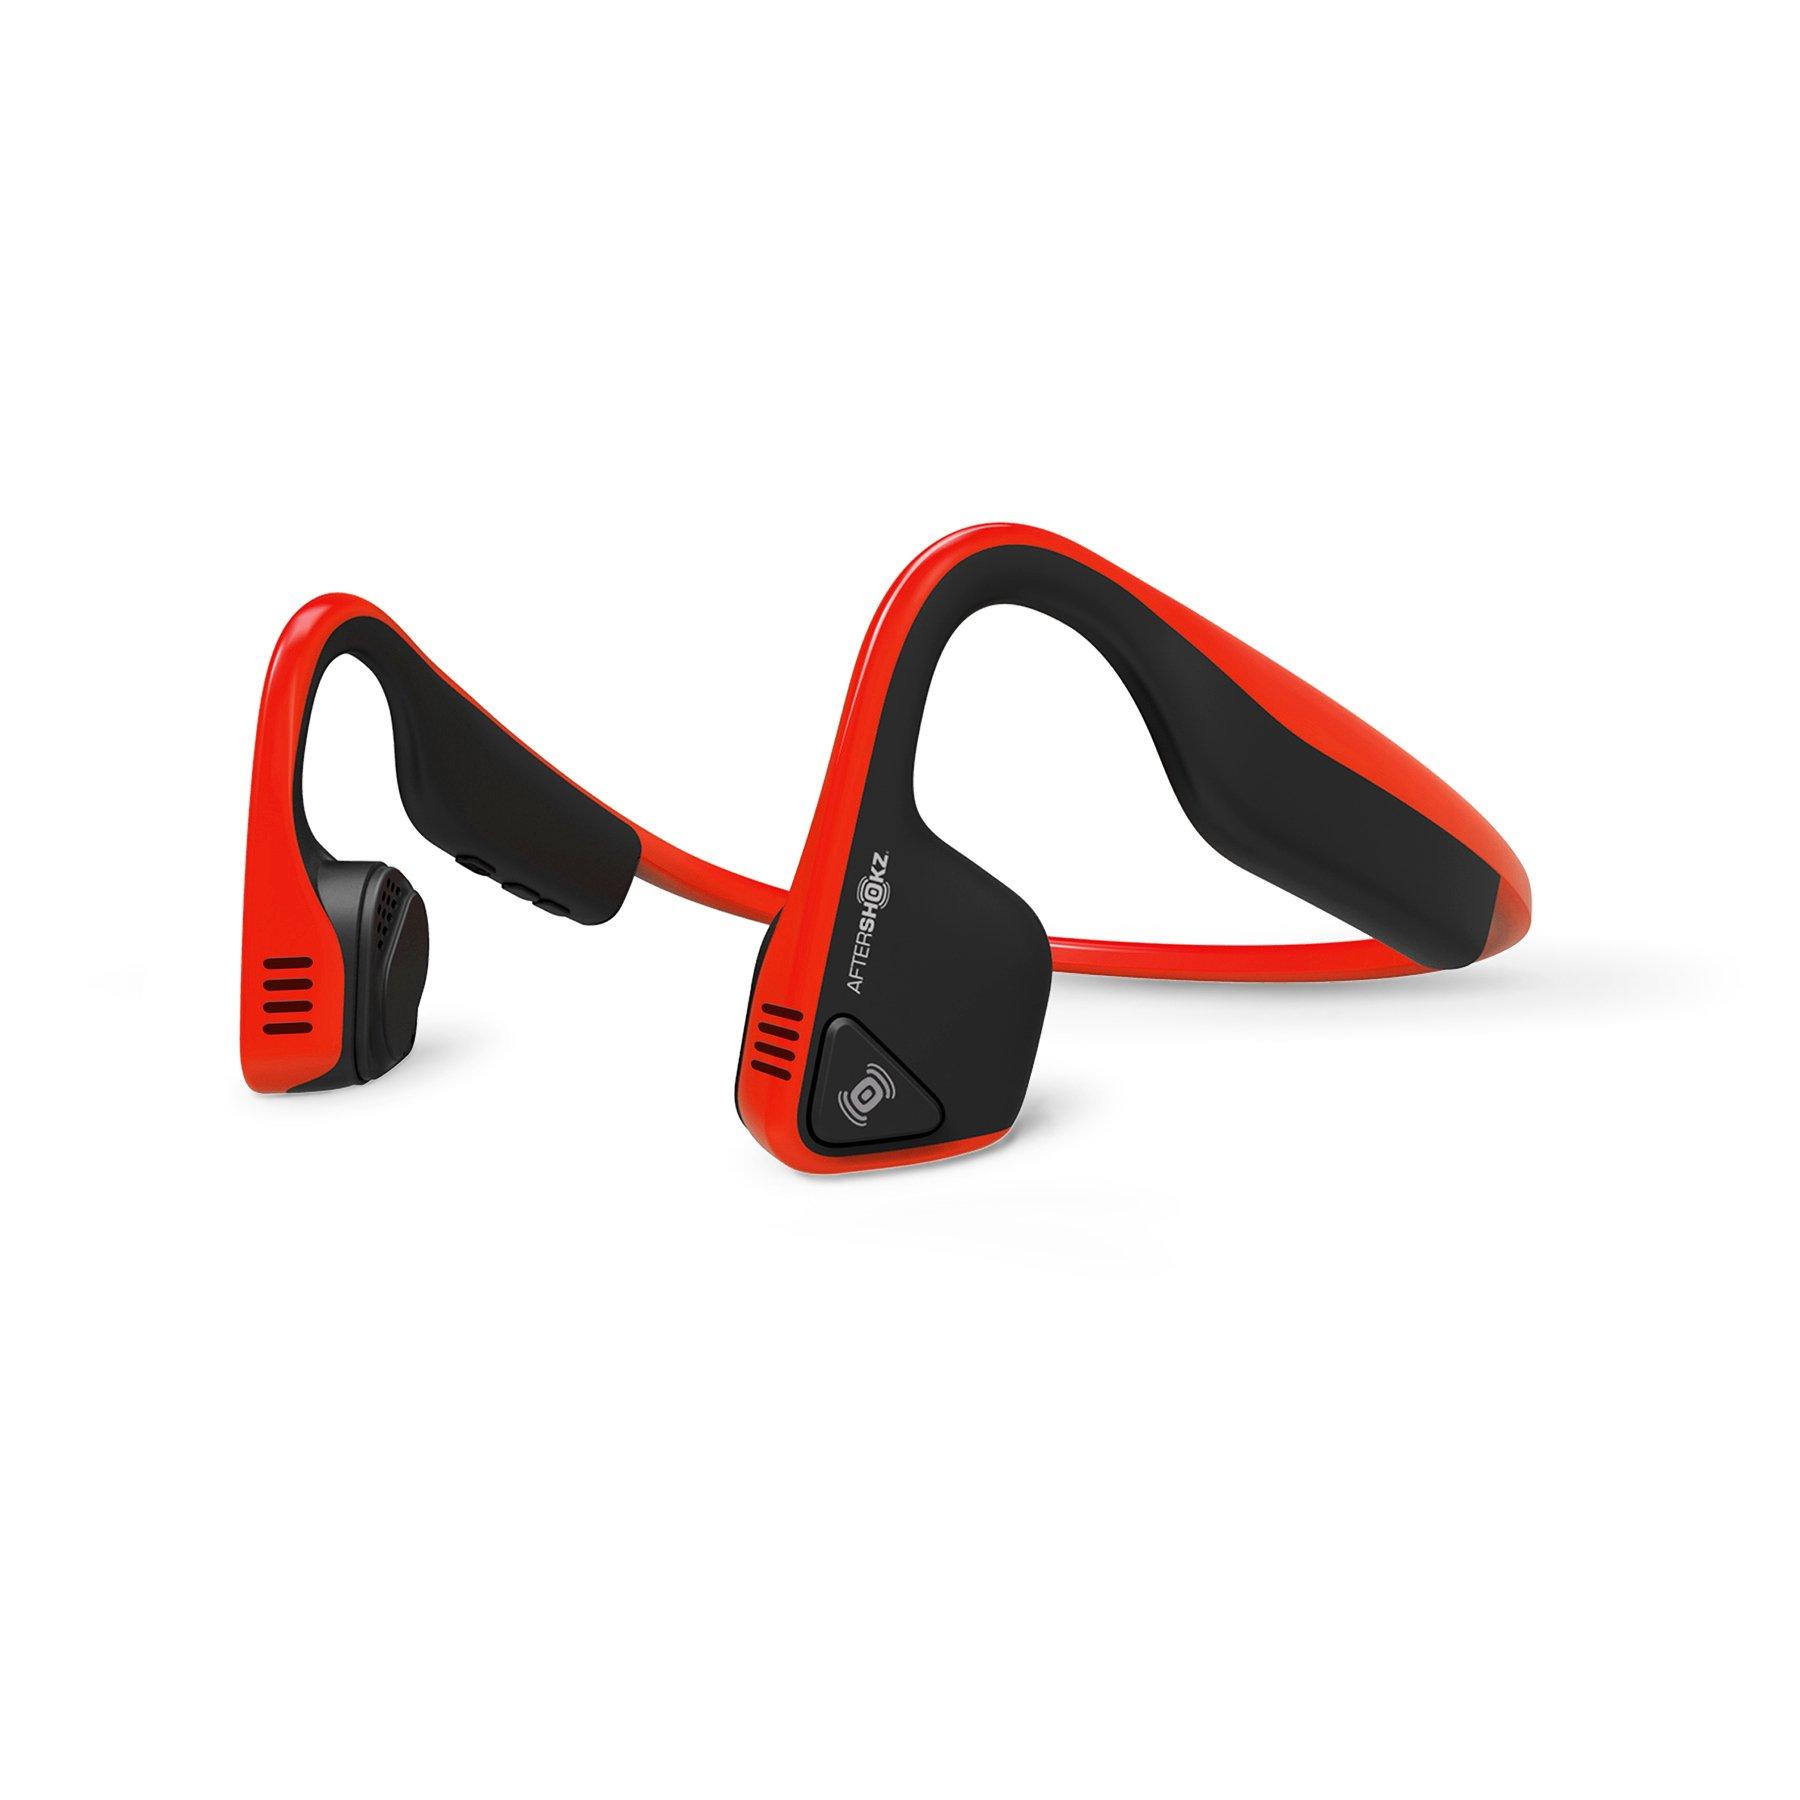 AfterShokz Trekz Titanium Open Ear Wireless Bone Conduction Headphones, Red, (AS600RD)